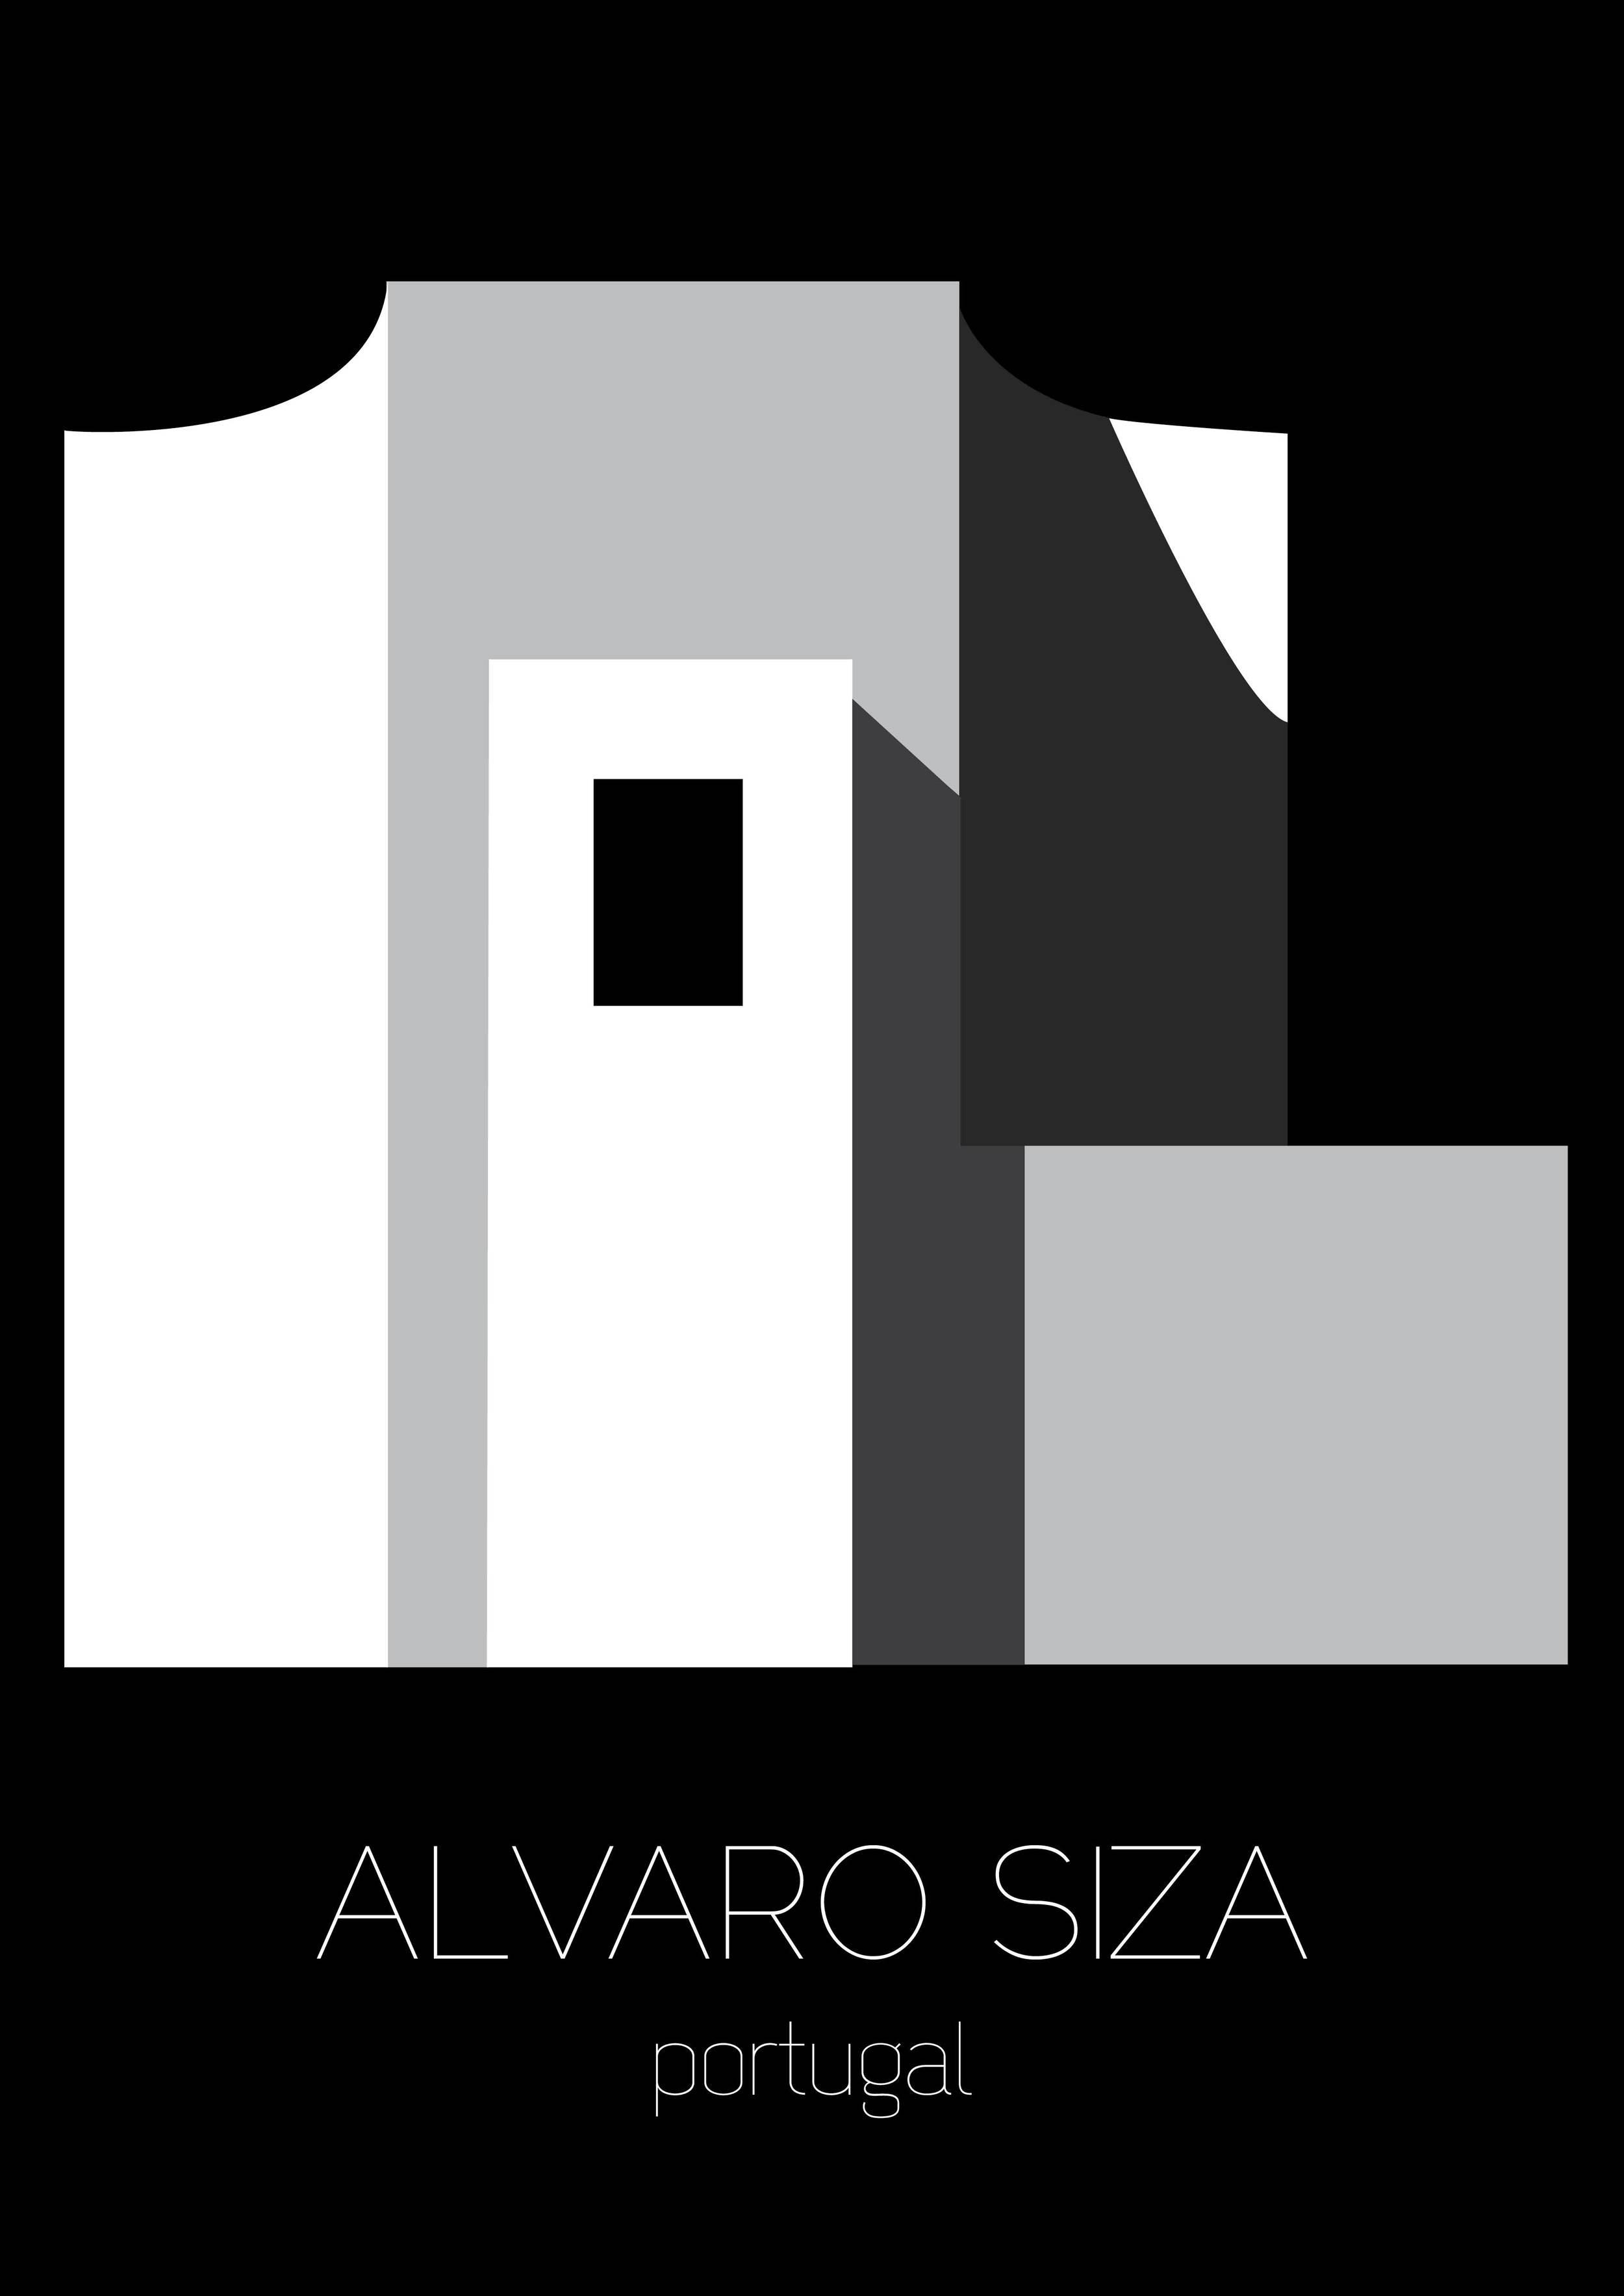 Poster d'architecture, Alvaro SIza - www.marionchibrard.com   please do not remove images credits